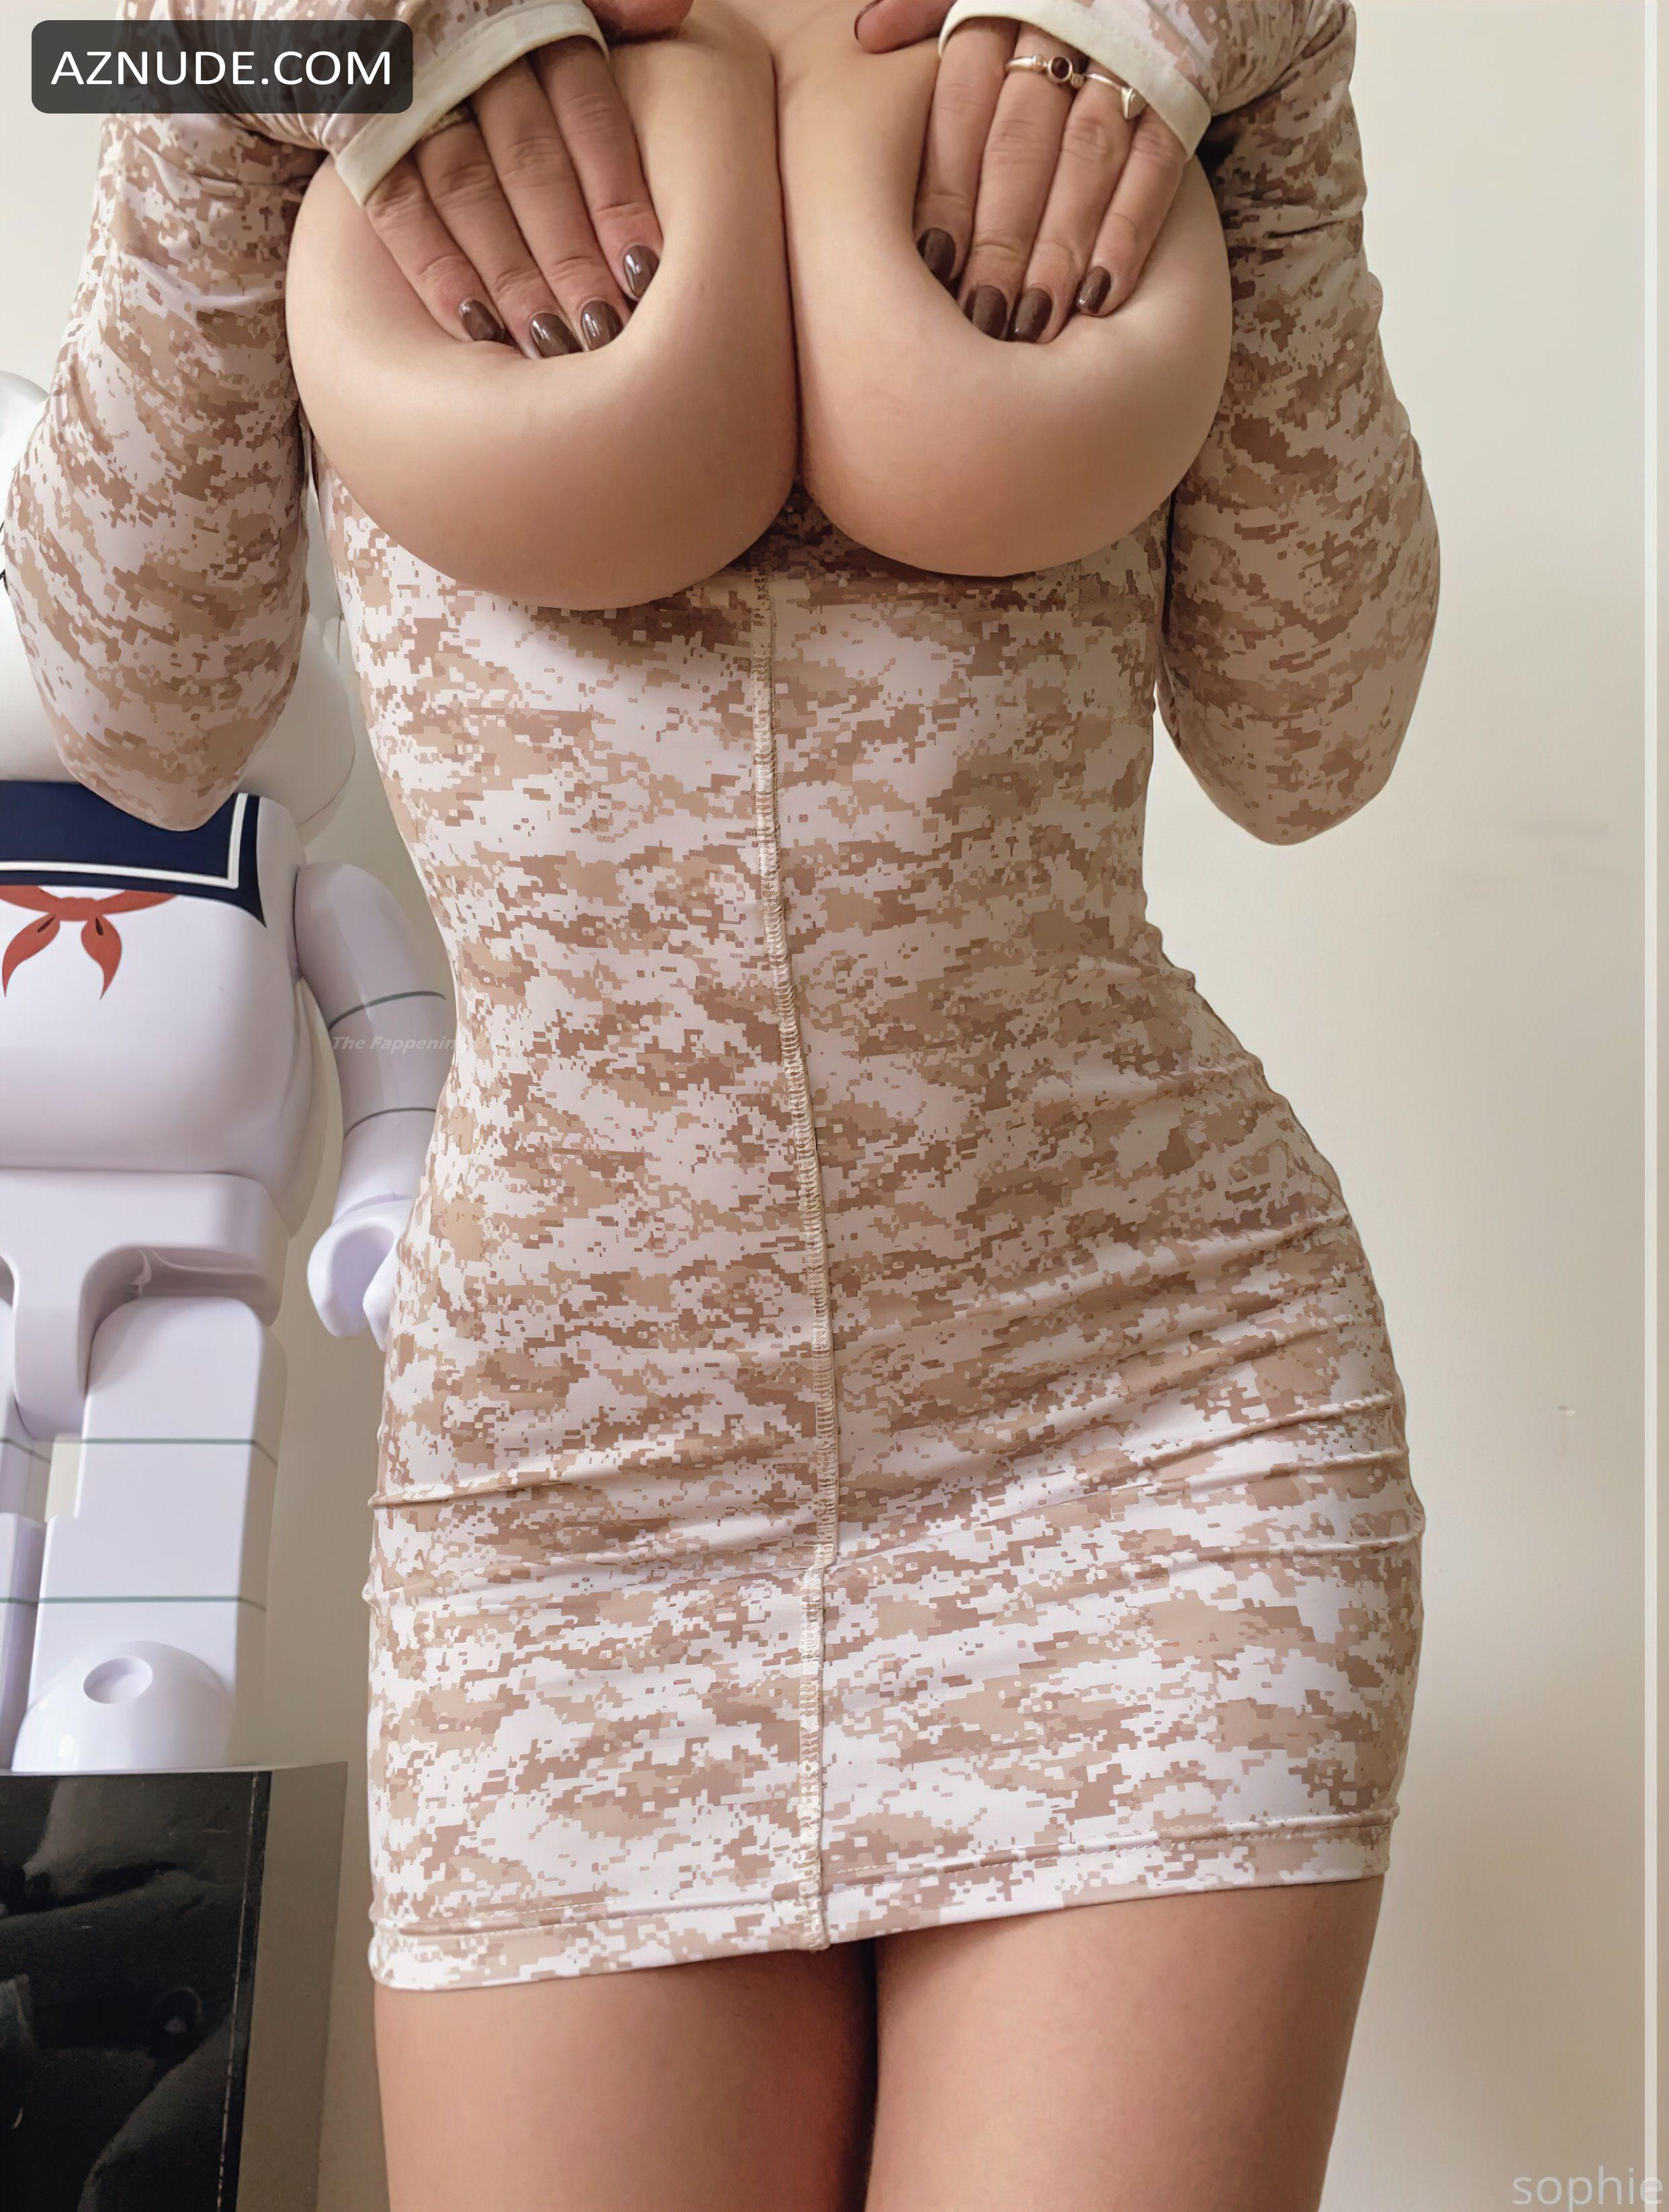 Naked sophie mudd Sophie Mudd